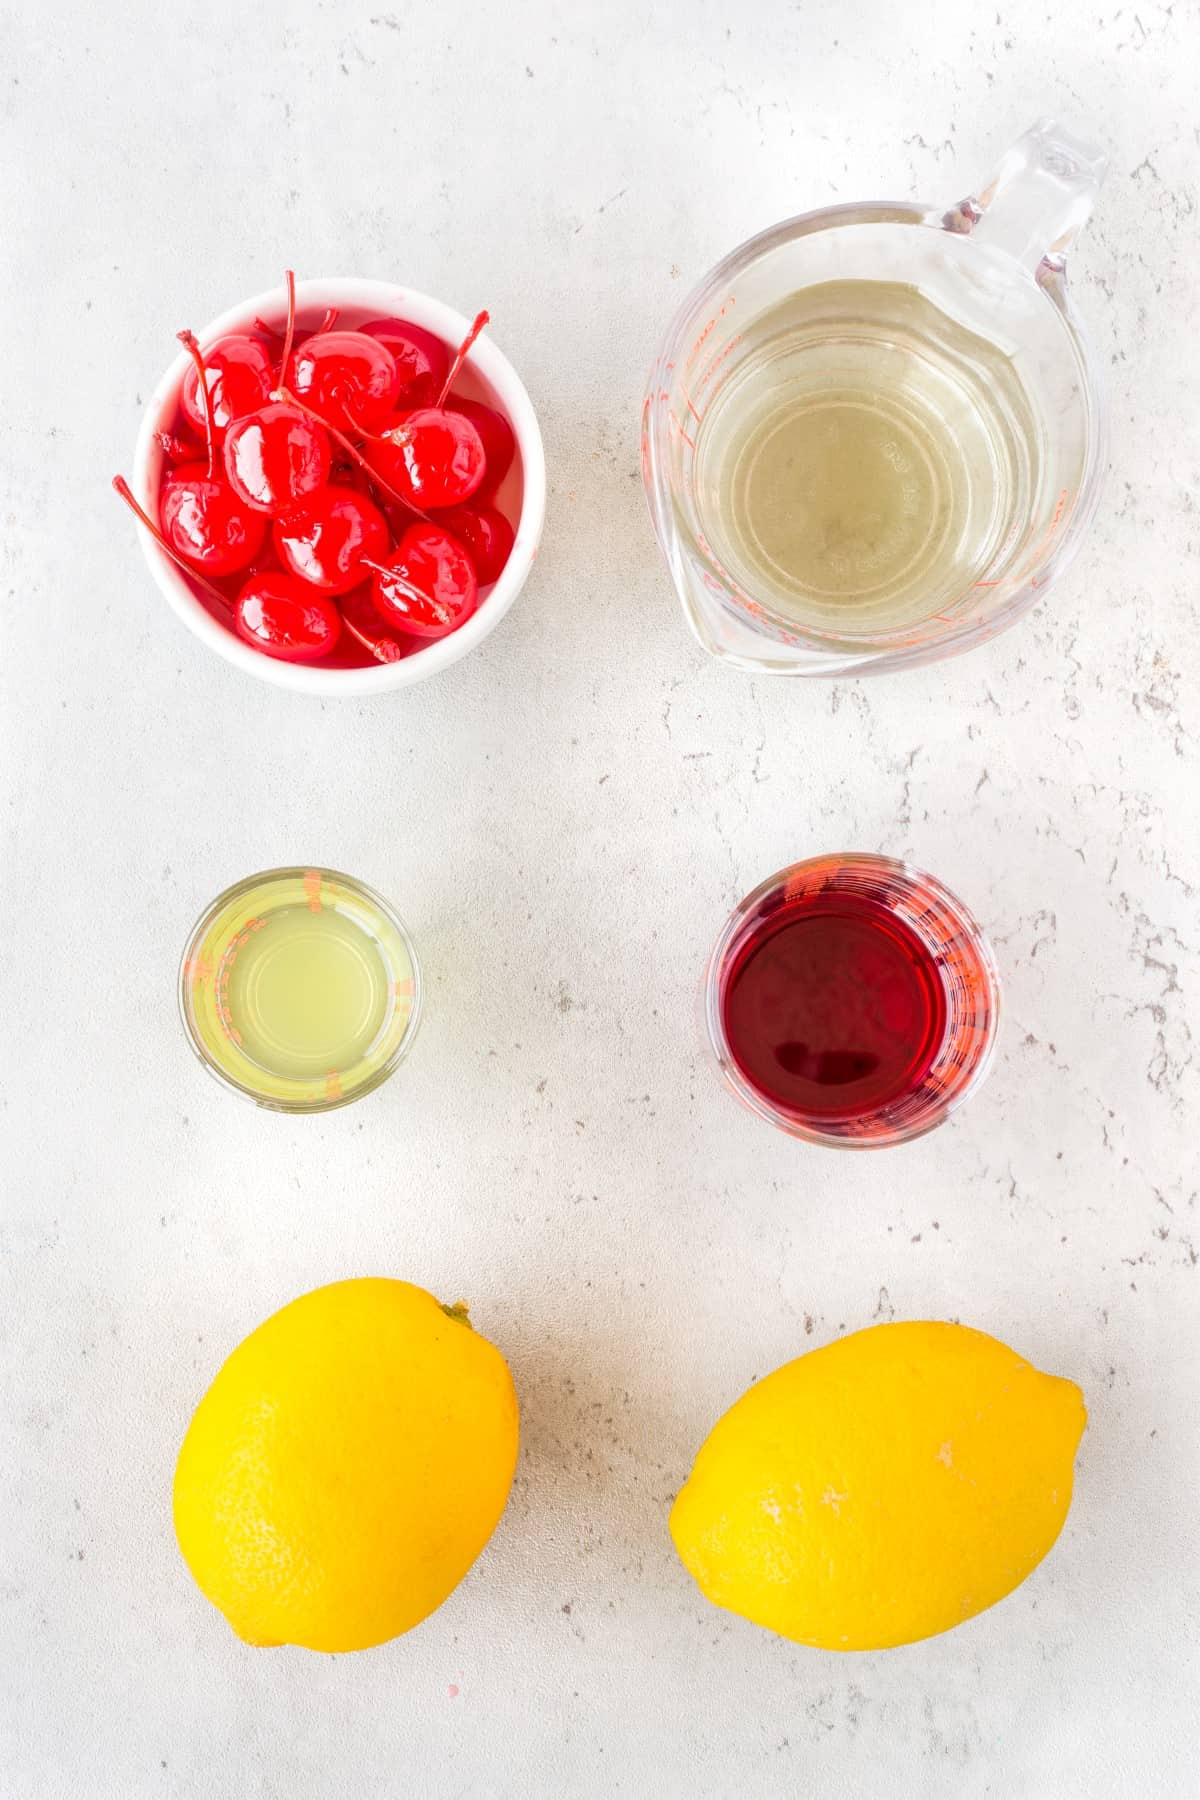 Ingredients for Lemon Cherry Martinis